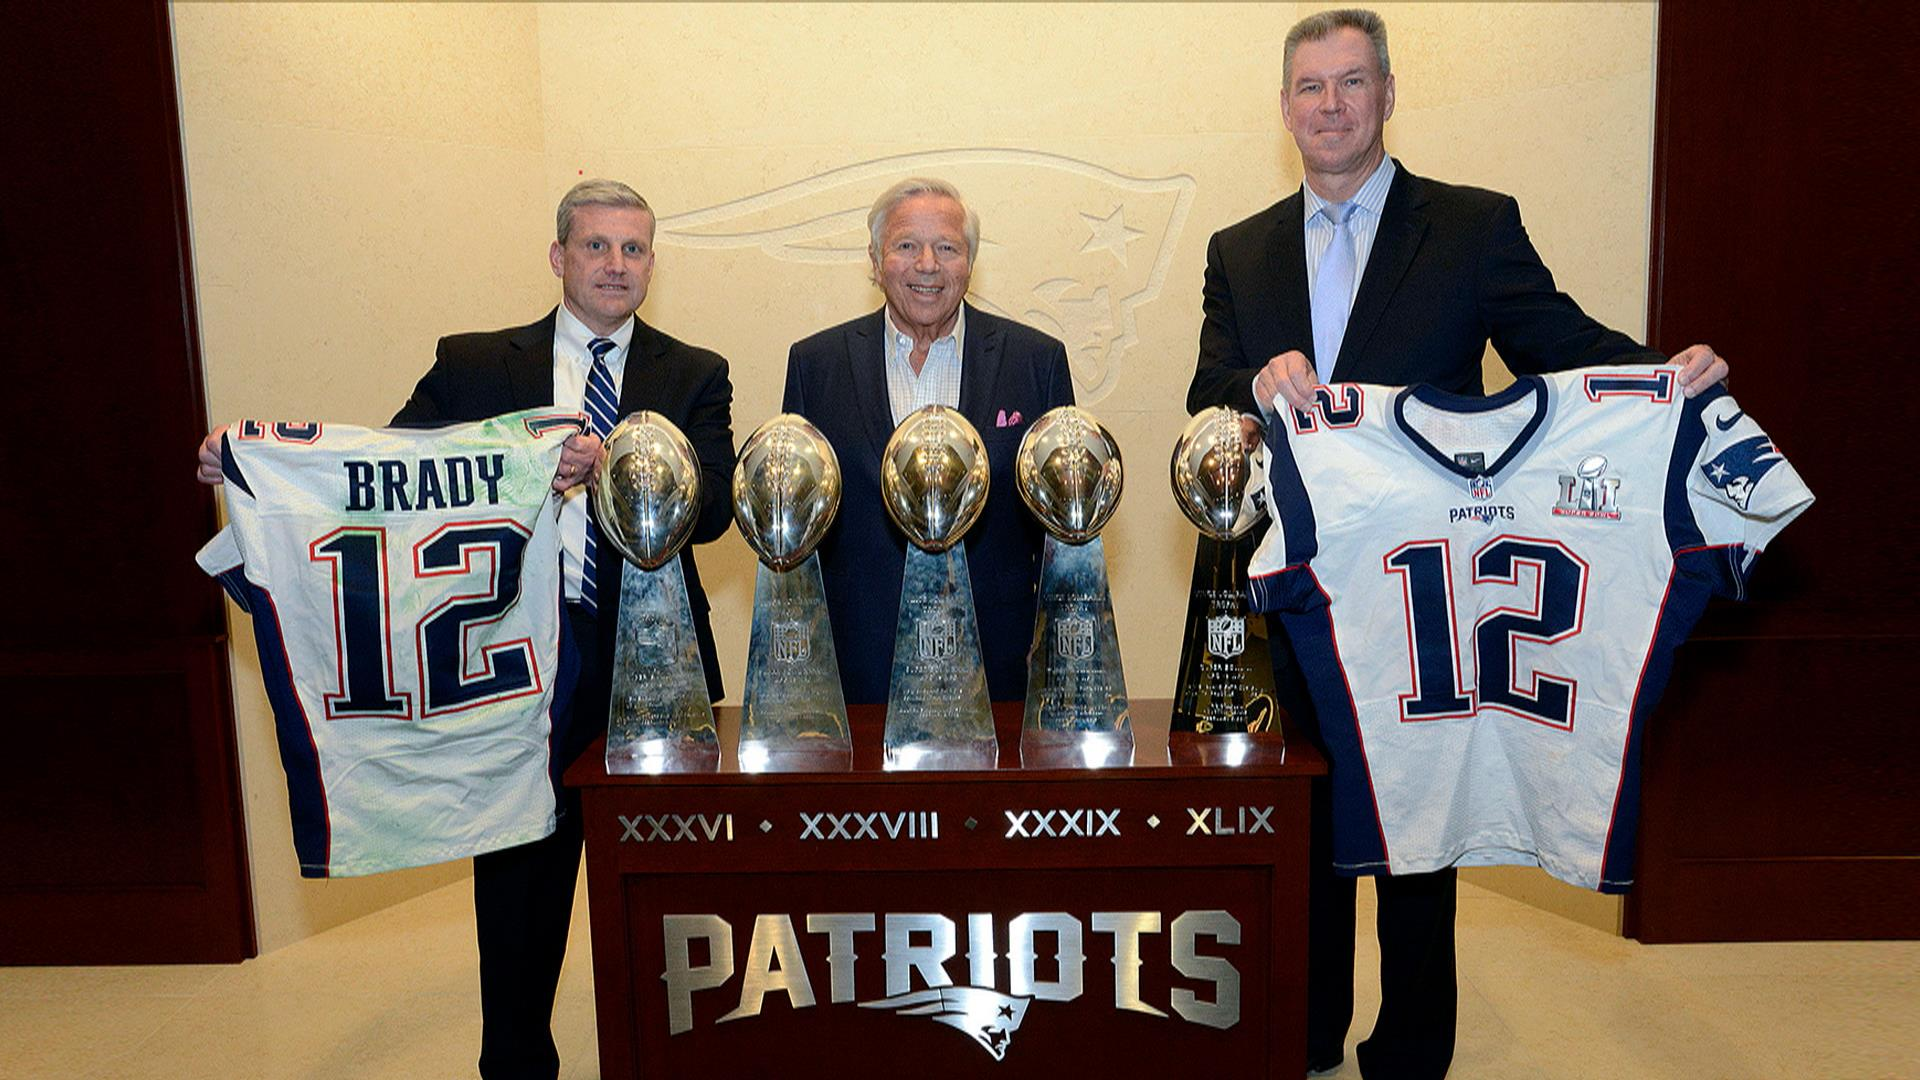 Tom Brady's Super Bowl jerseys are safely returned at last